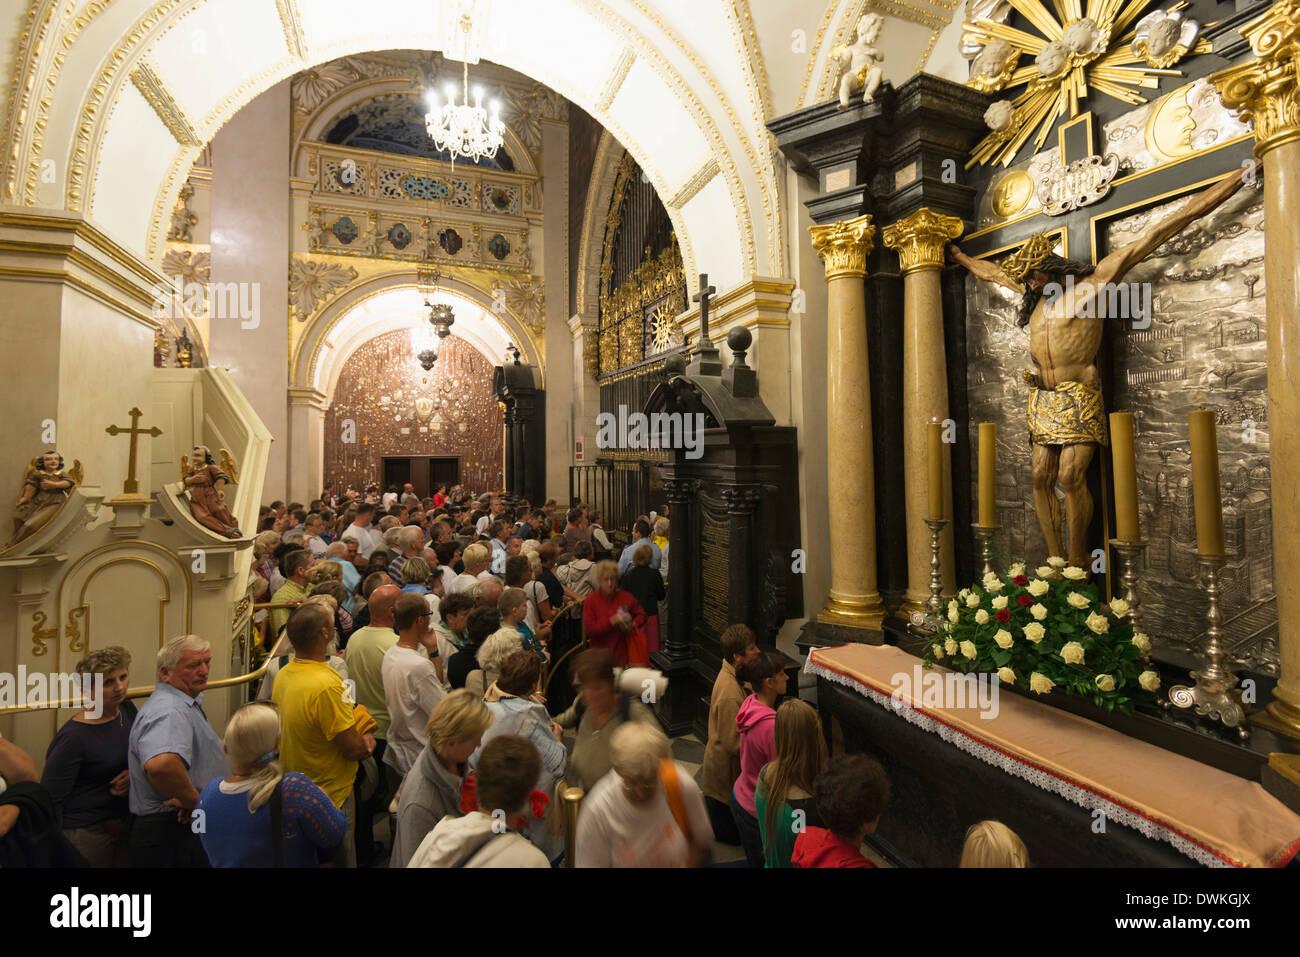 Pilgrims at Monastery of Jasna Gora, during the Marian Feast of Assumption, Czestochowa, Malopolska, Poland, Europe - Stock Image